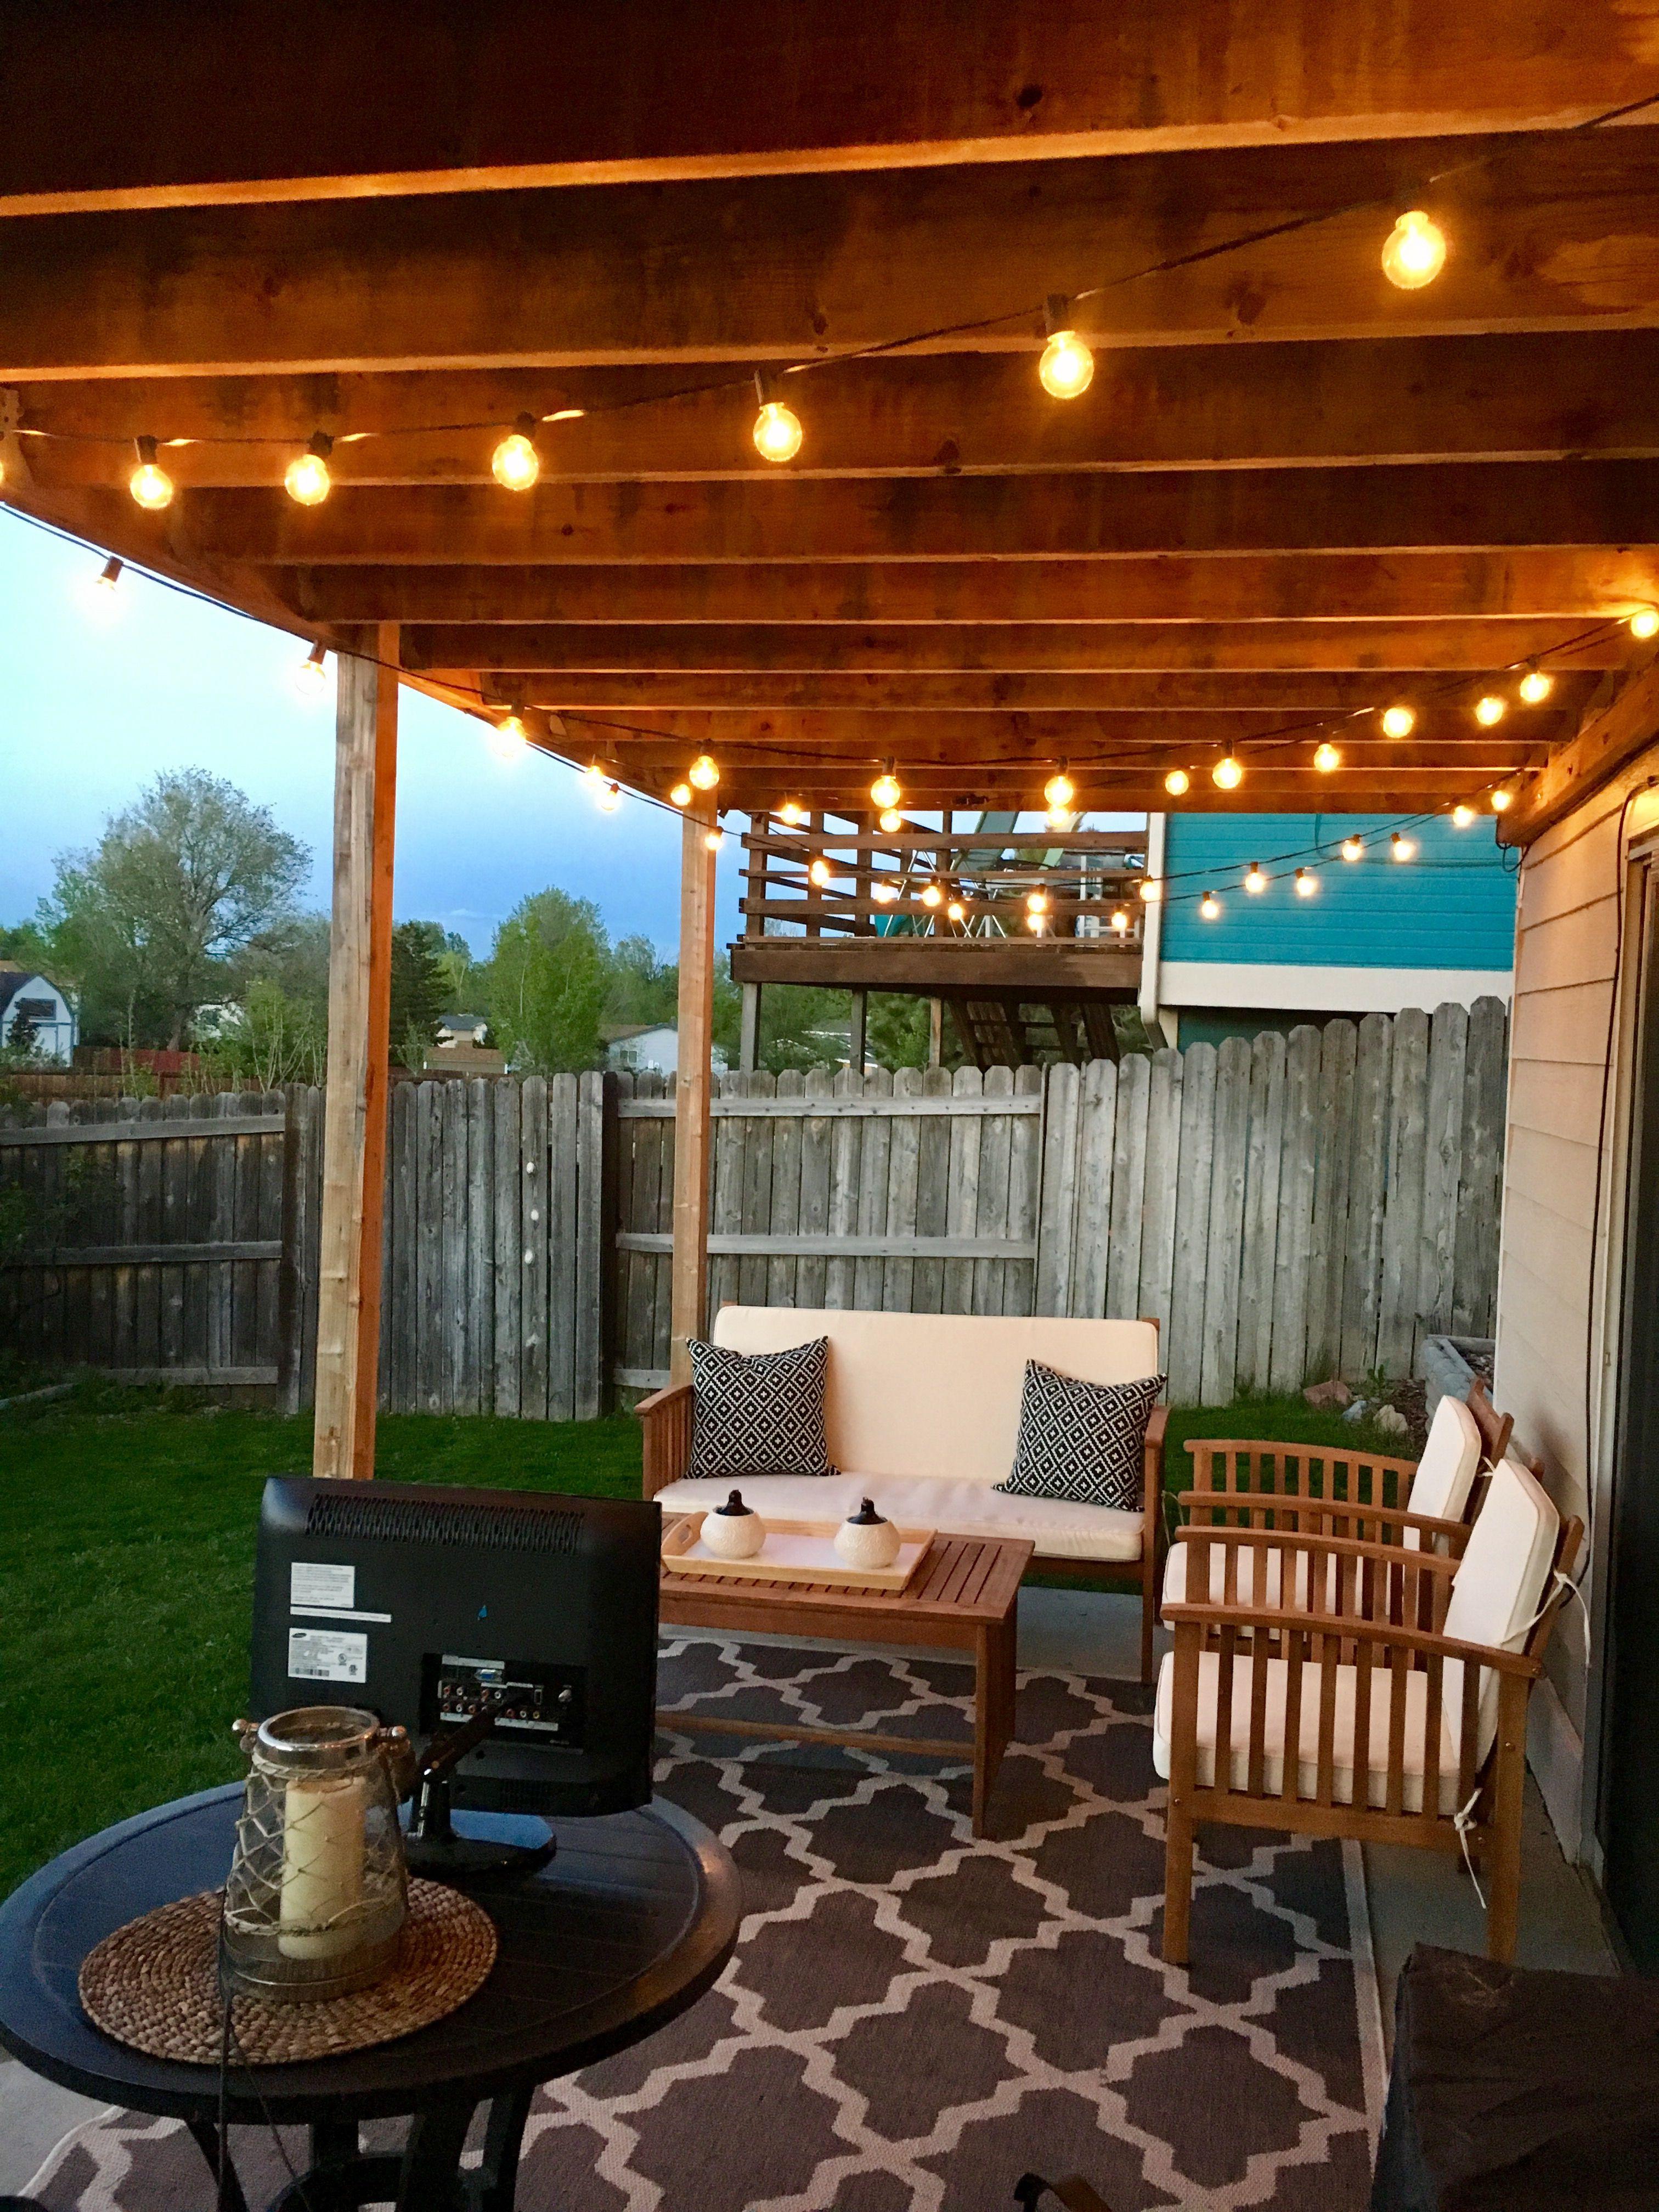 DIY patio. Patio lights. Patio decor. Patio makeover ... on Small Backyard Covered Patio Ideas id=27176